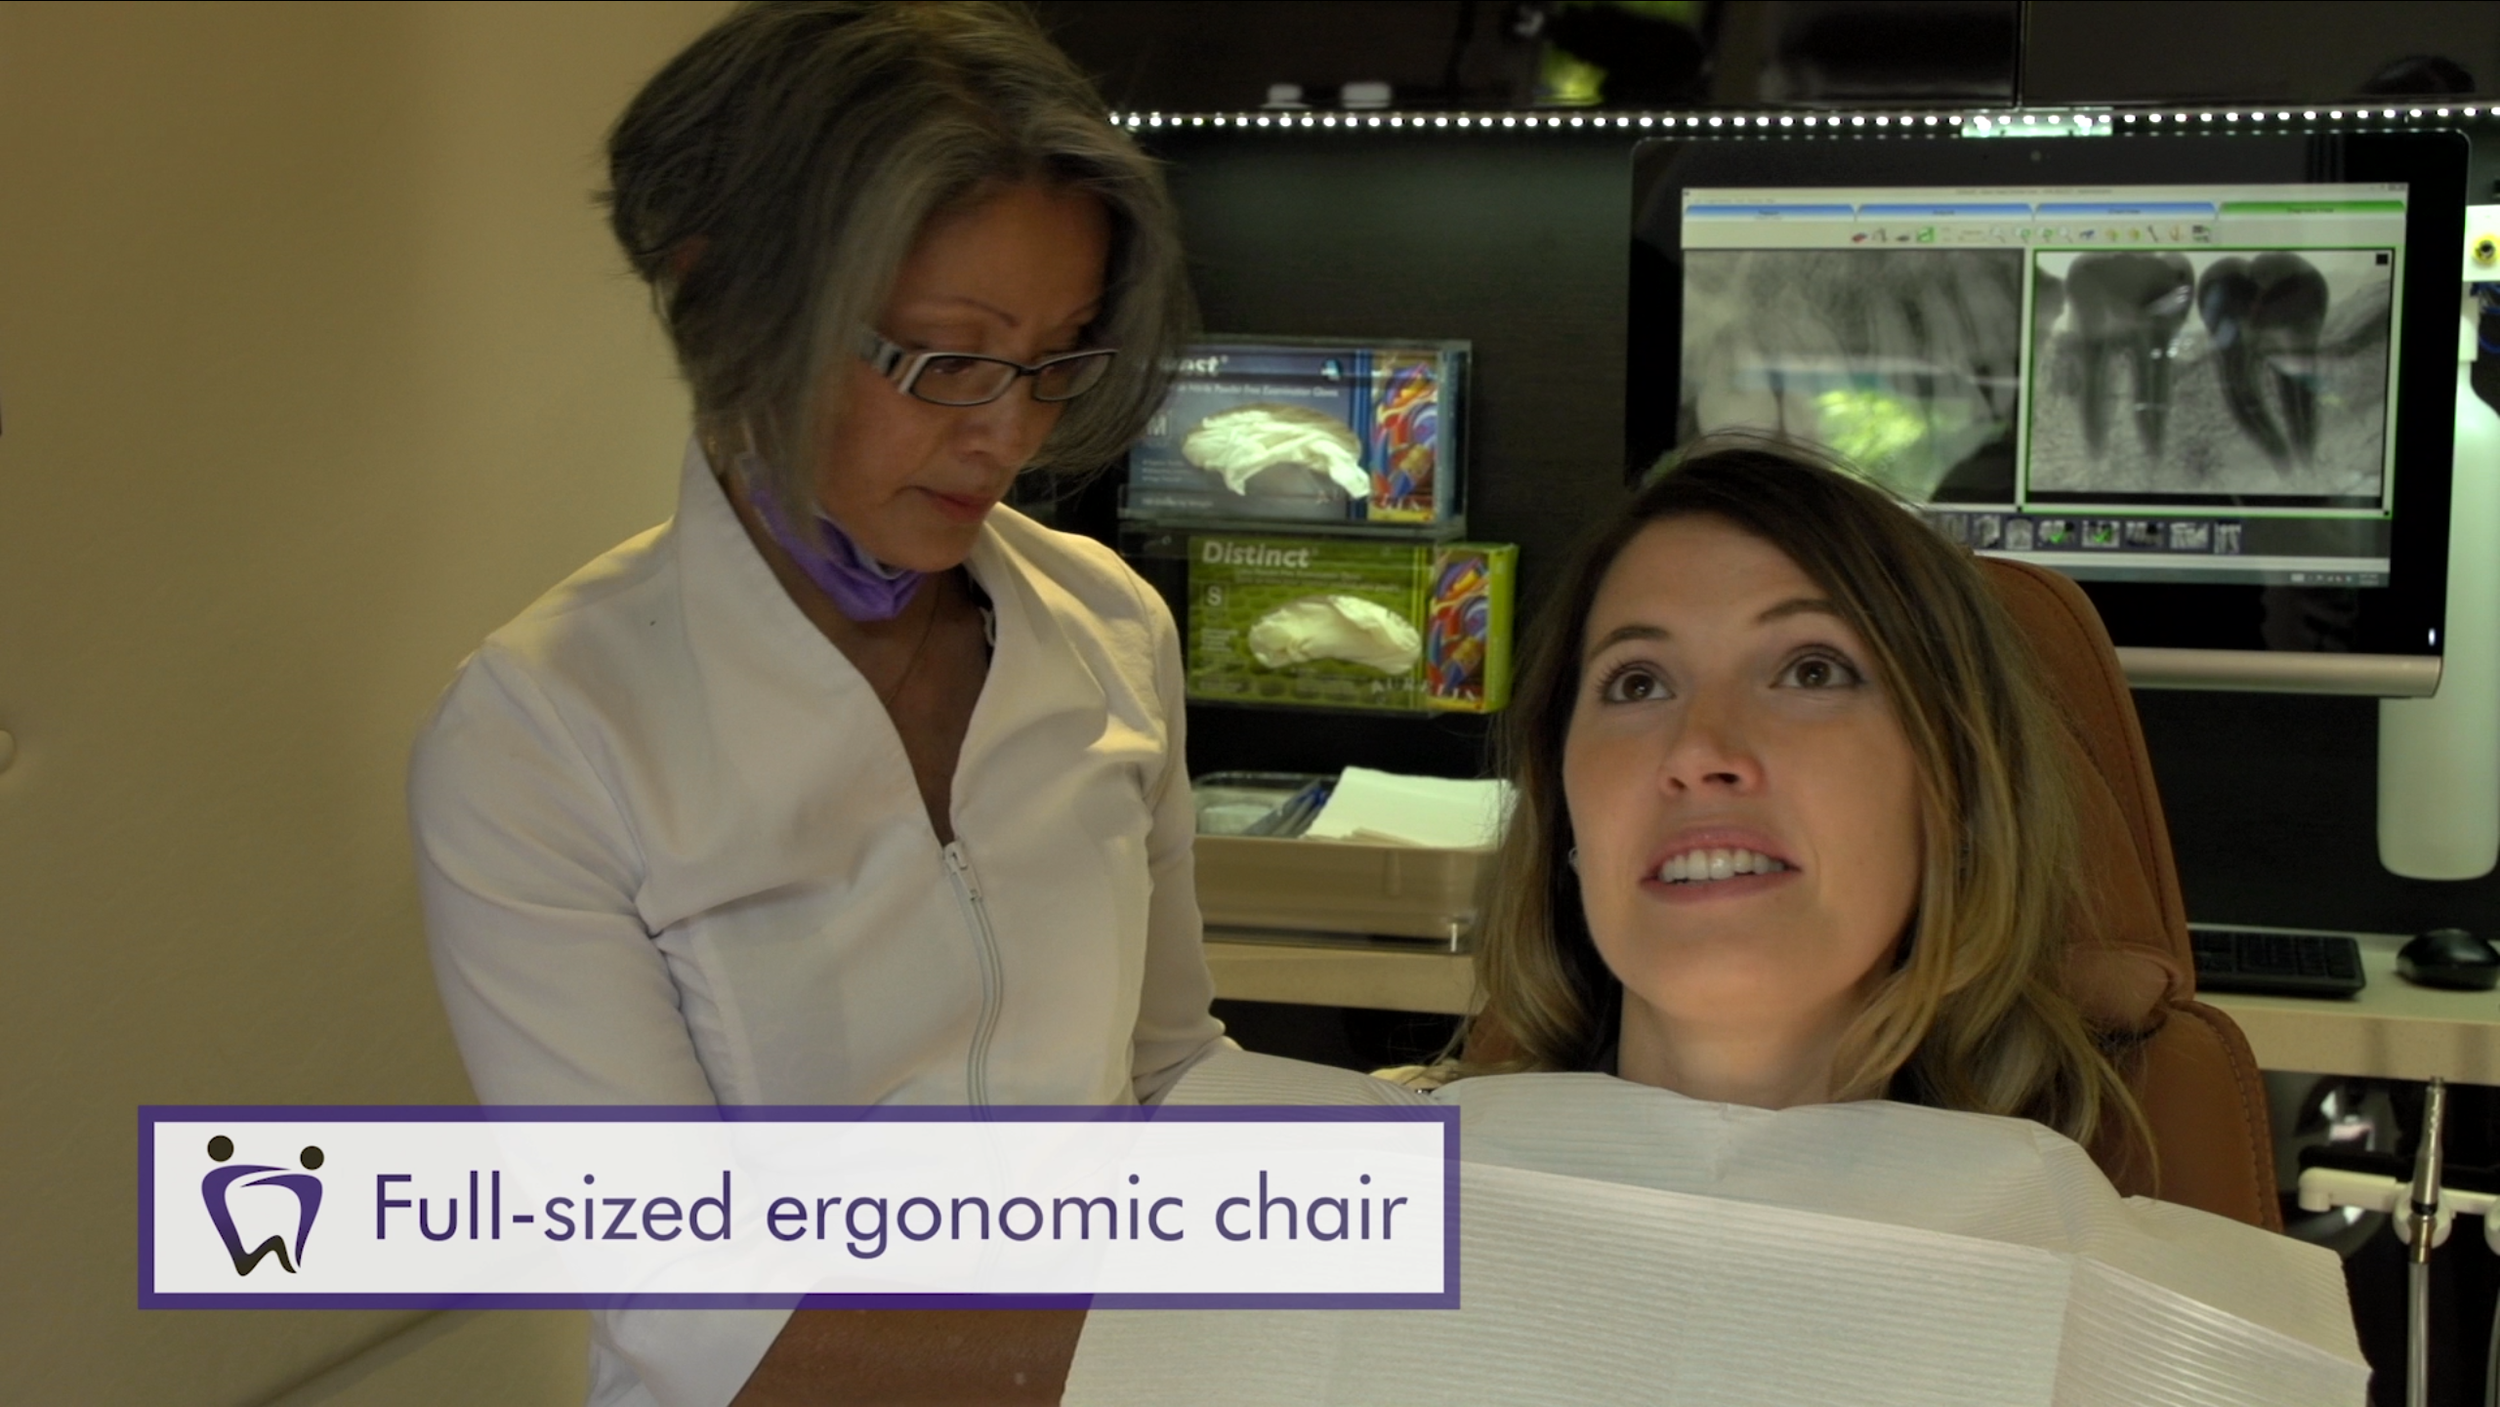 Full-sized ergonomic chair